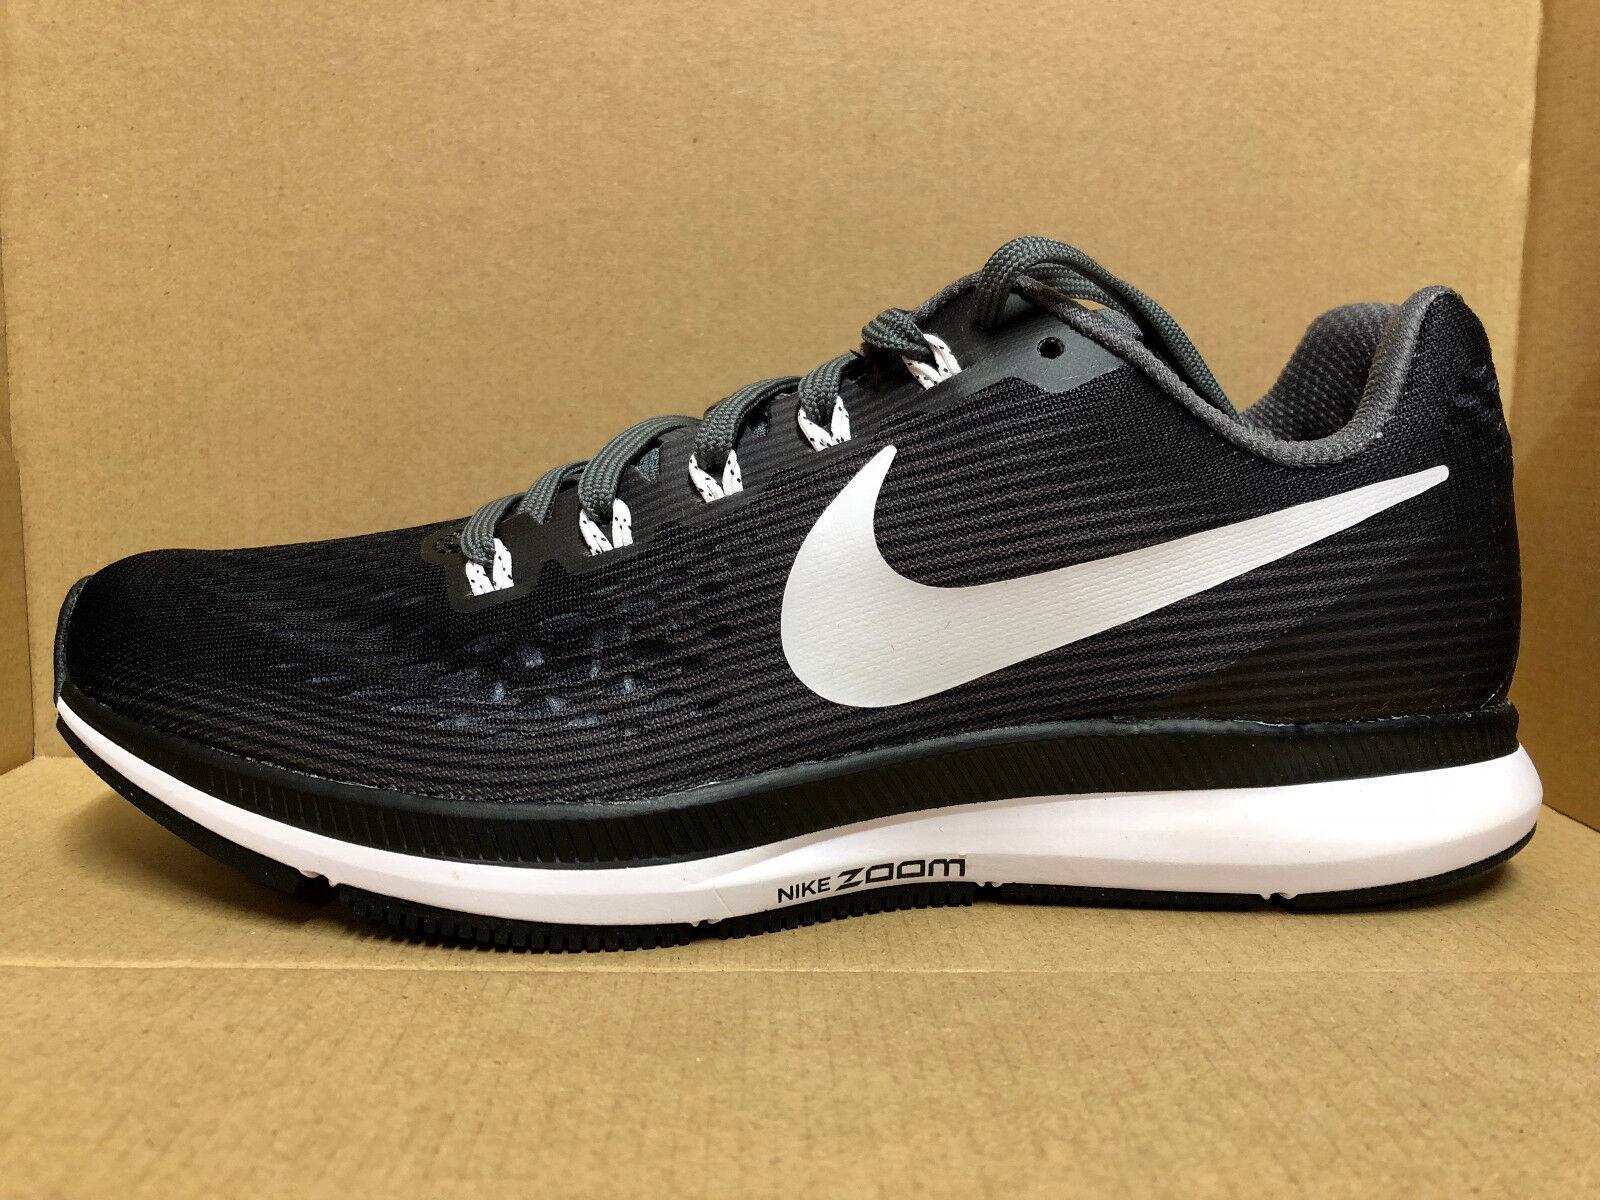 MUJER Nike Air Zoom Pegaso 34Tb Zapatos Negro blancoo blancoo blancoo gris 887017 001  directo de fábrica